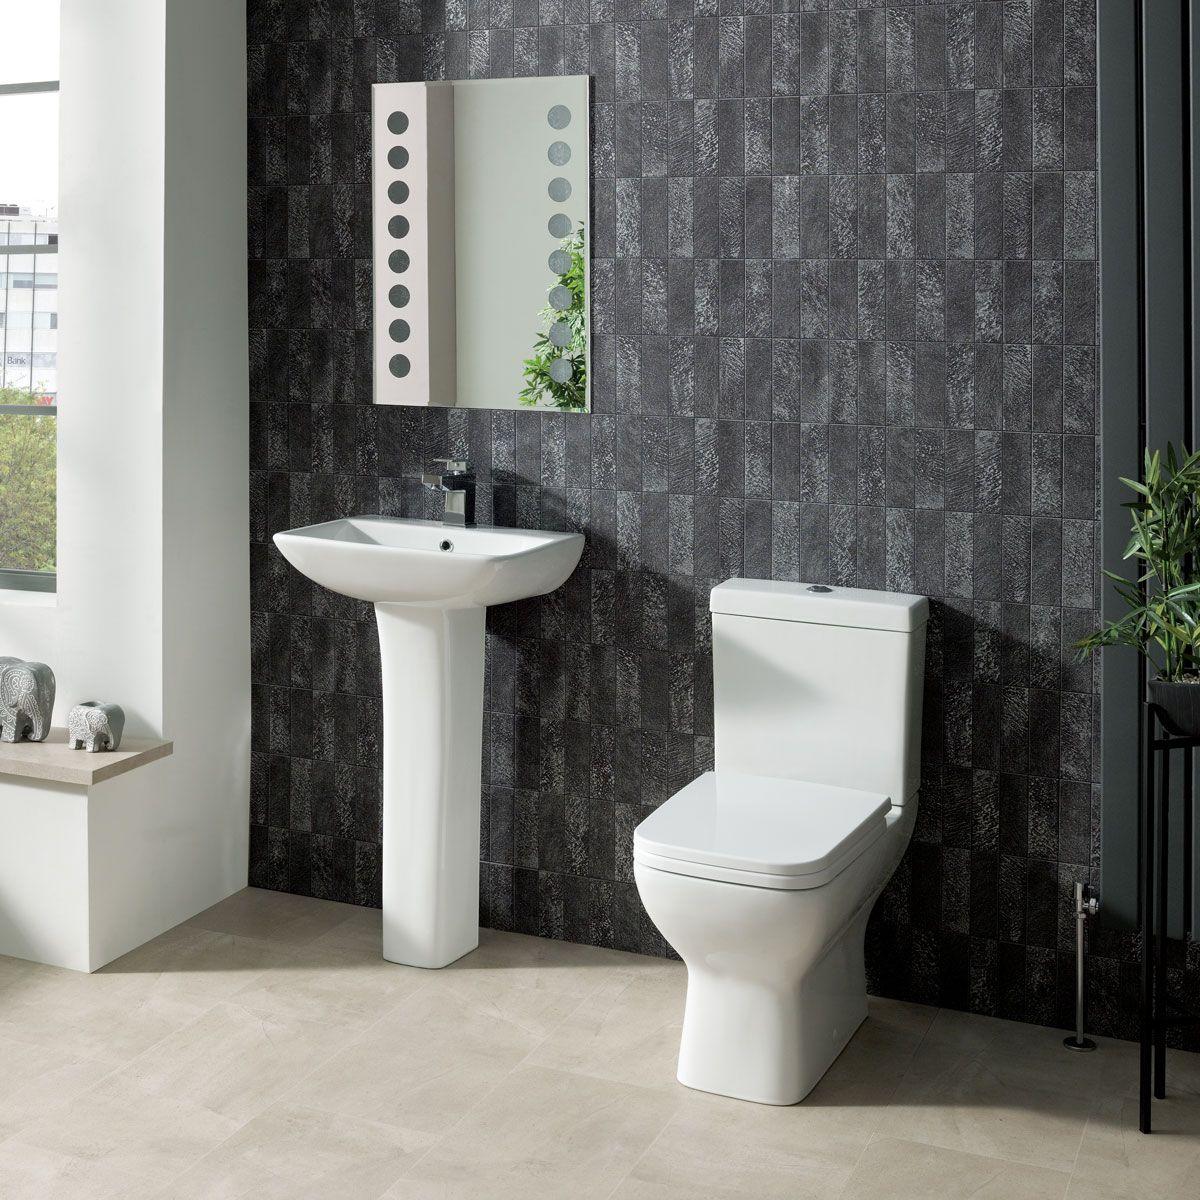 Richmond 1 Tap Hole Basin Pedestal Bathroom Sink 500mm